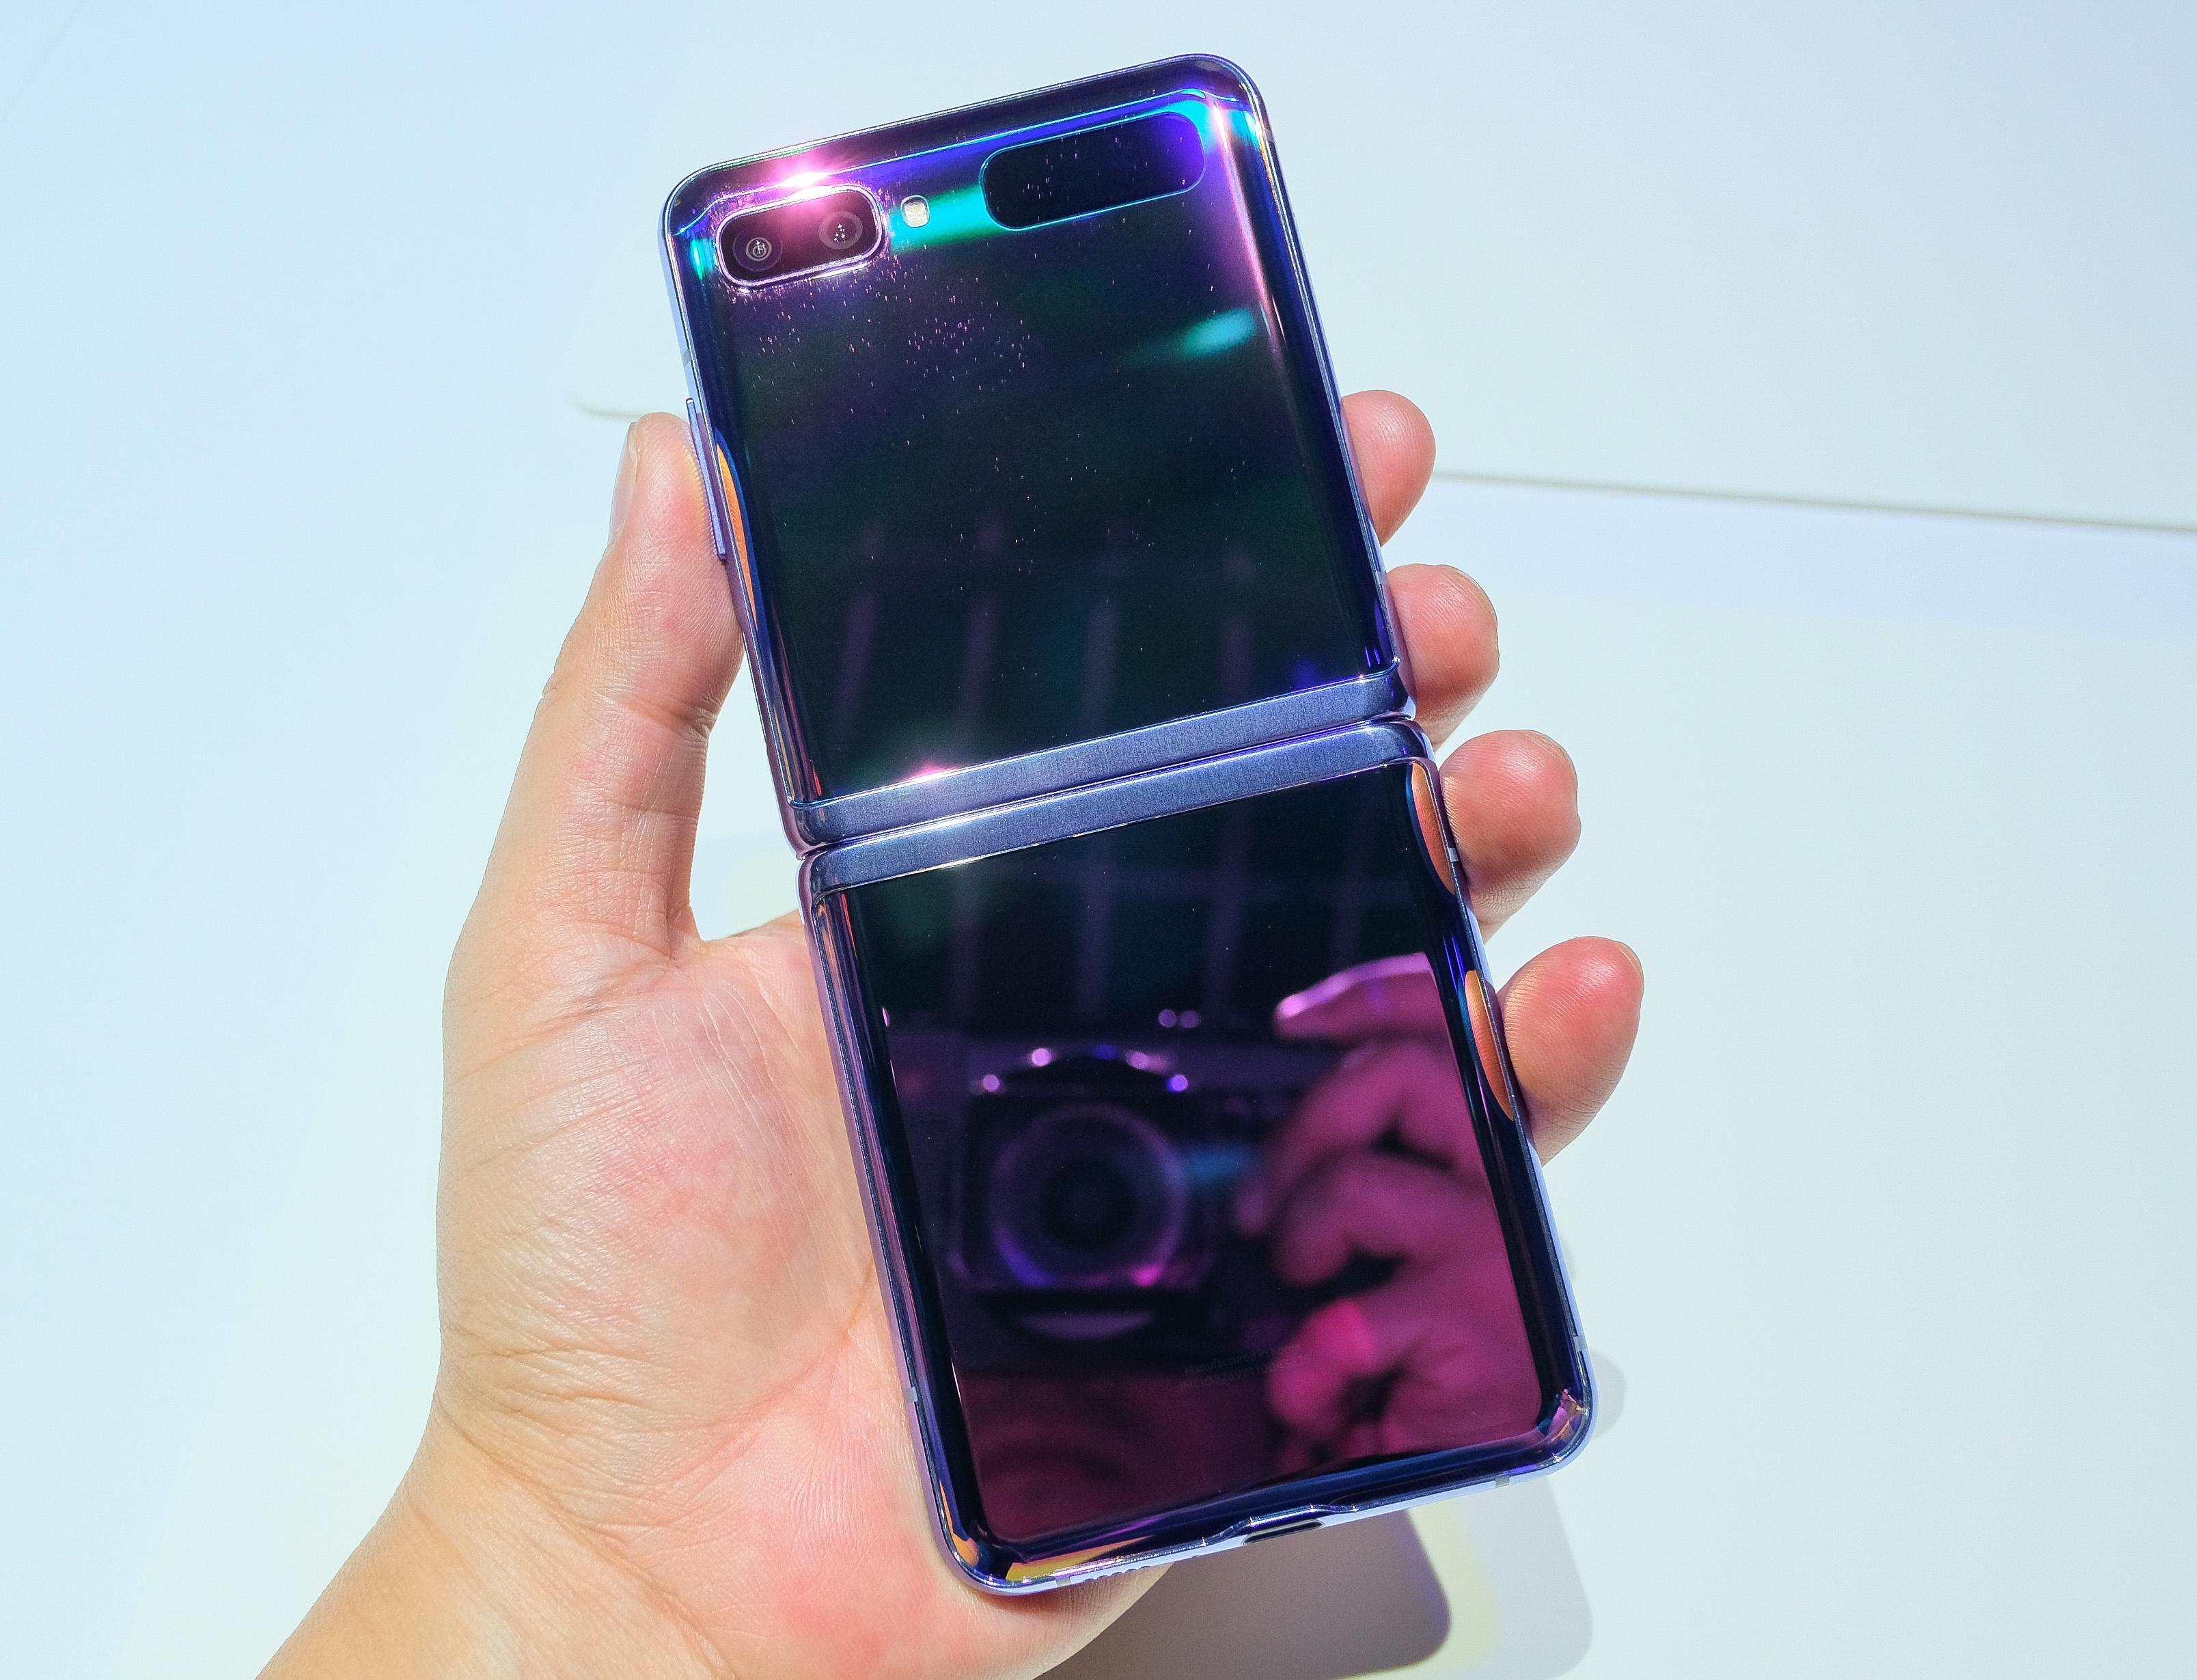 Anh thuc te Galaxy Z Flip - cach mang moi cua Samsung hinh anh 2 galaxy_s20_zing_3242.jpg